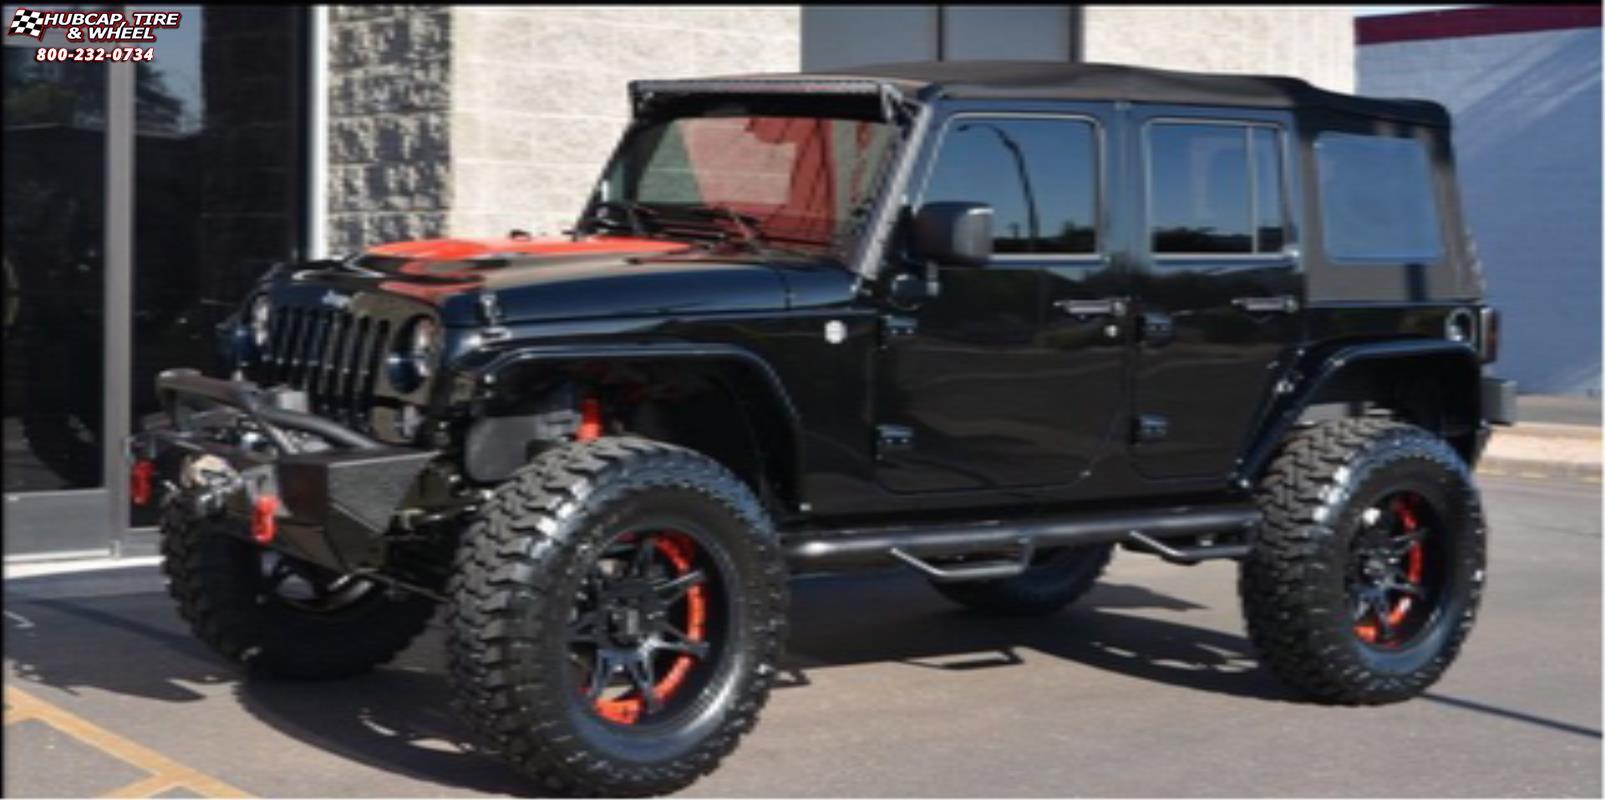 Jeep Wrangler Tops >> Jeep Wrangler Moto Metal MO961 Wheels Satin Black Red Insert